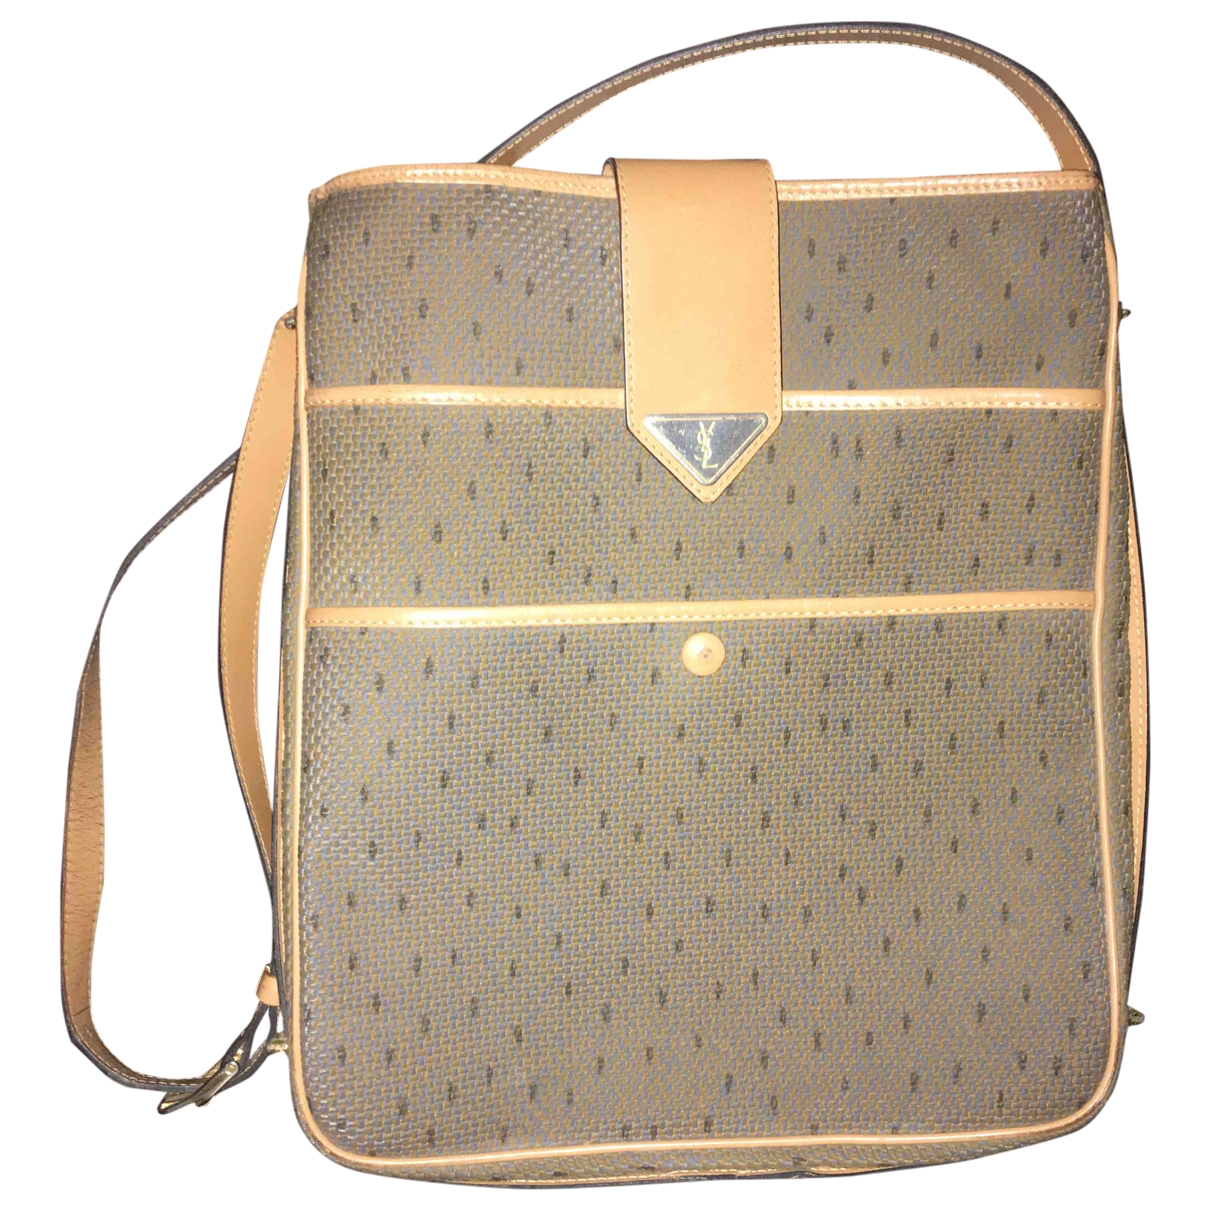 Yves Saint Laurent \N Cloth handbag for Women \N